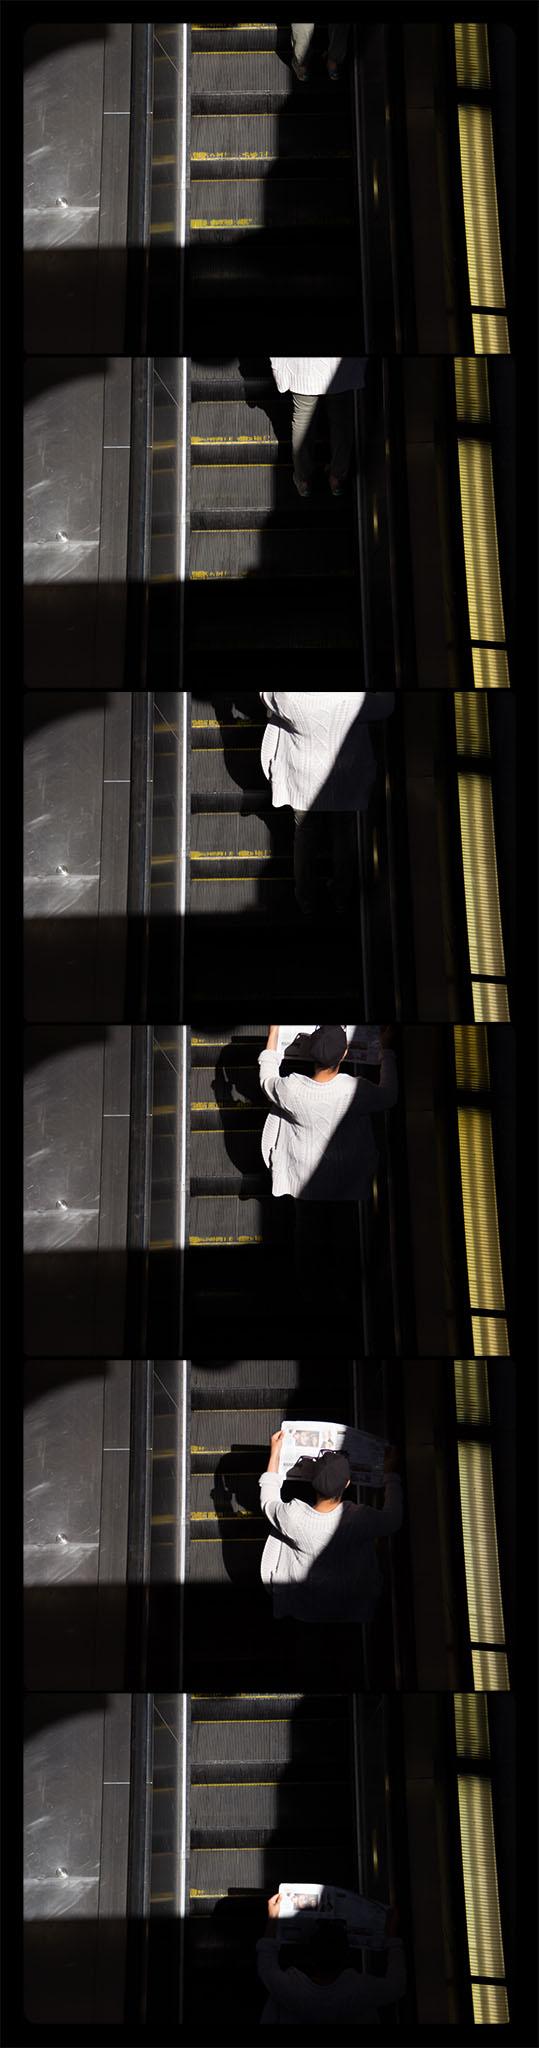 Metro Rail, Gallery Place-Chinatown, 4-21-2012-5785-5793